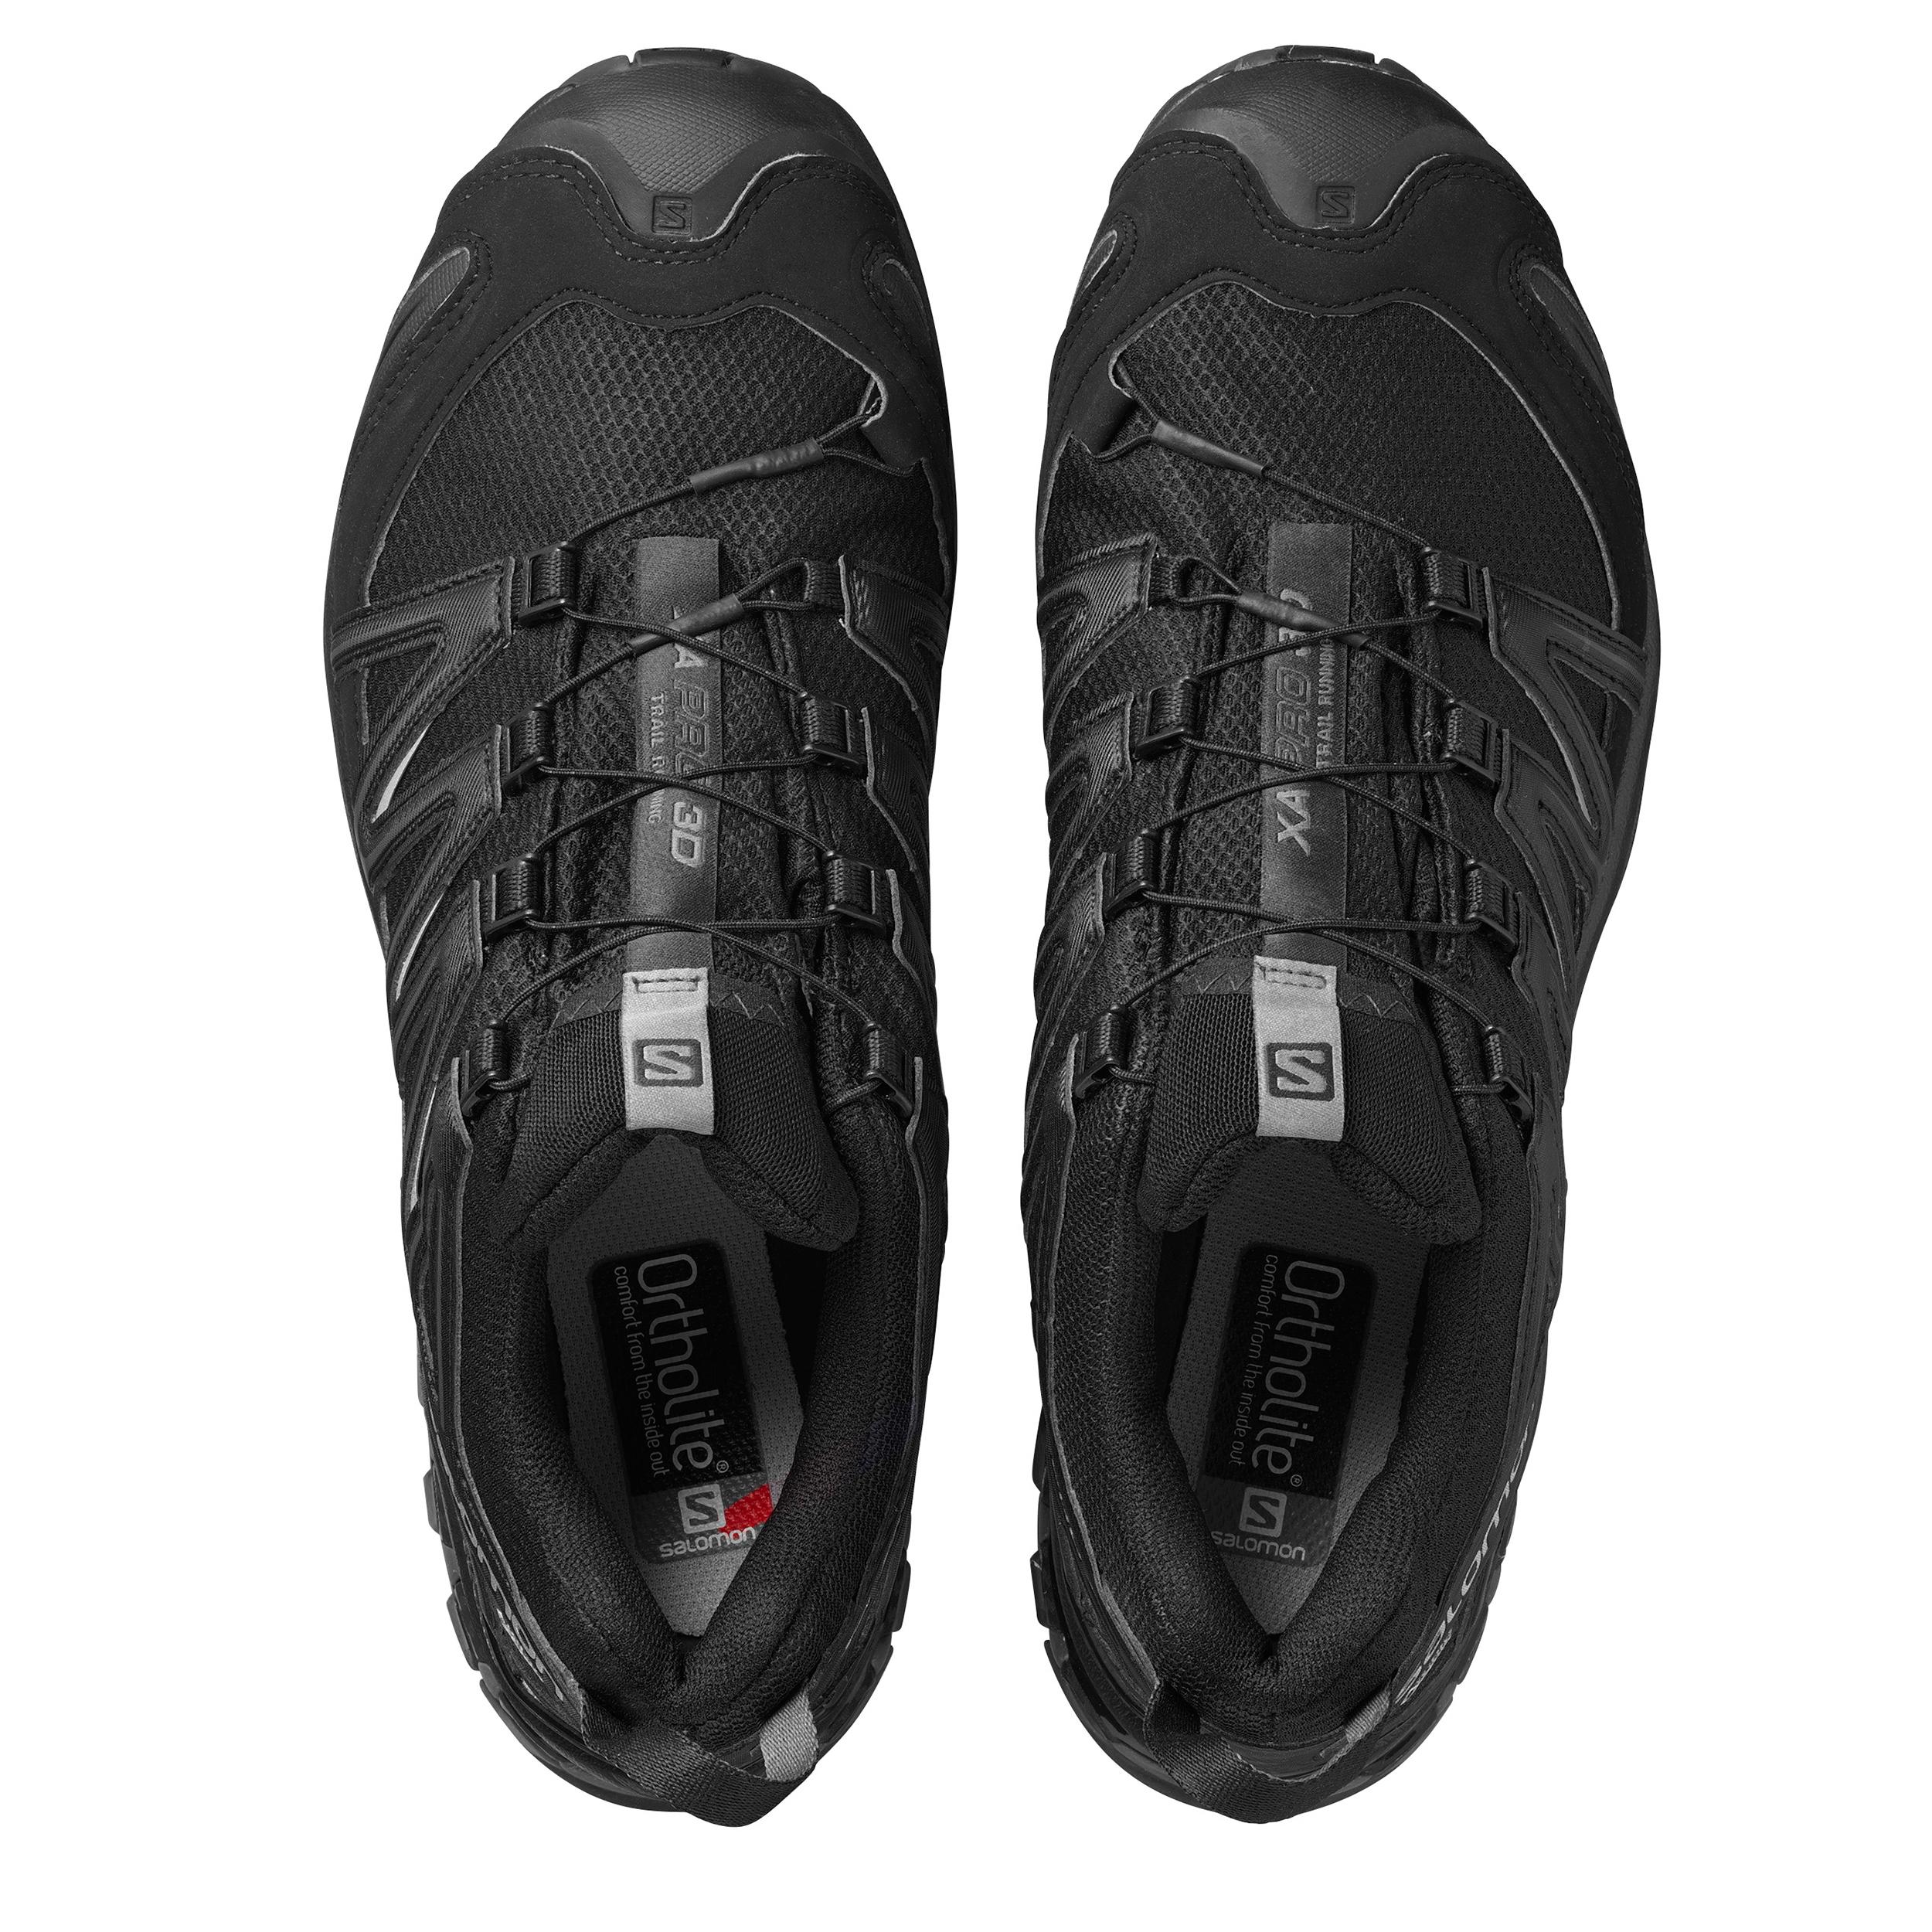 grand choix de cbc9e e7c9d Salomon XA Pro 3D GTX Trail Running Shoes - Men's